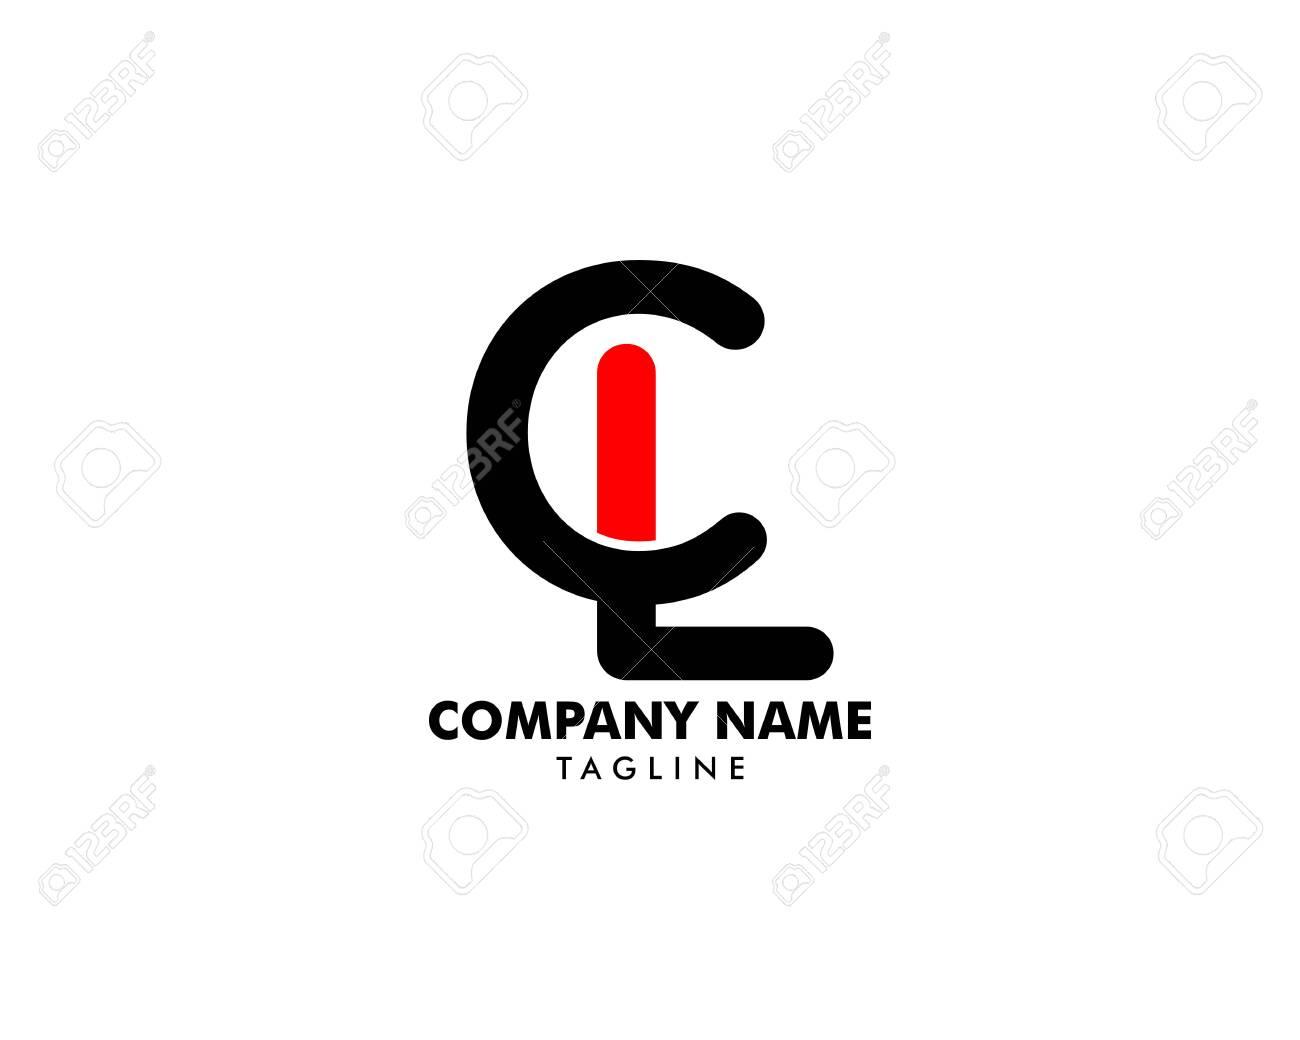 Initial Letter CL Logo Template Design - 126329753